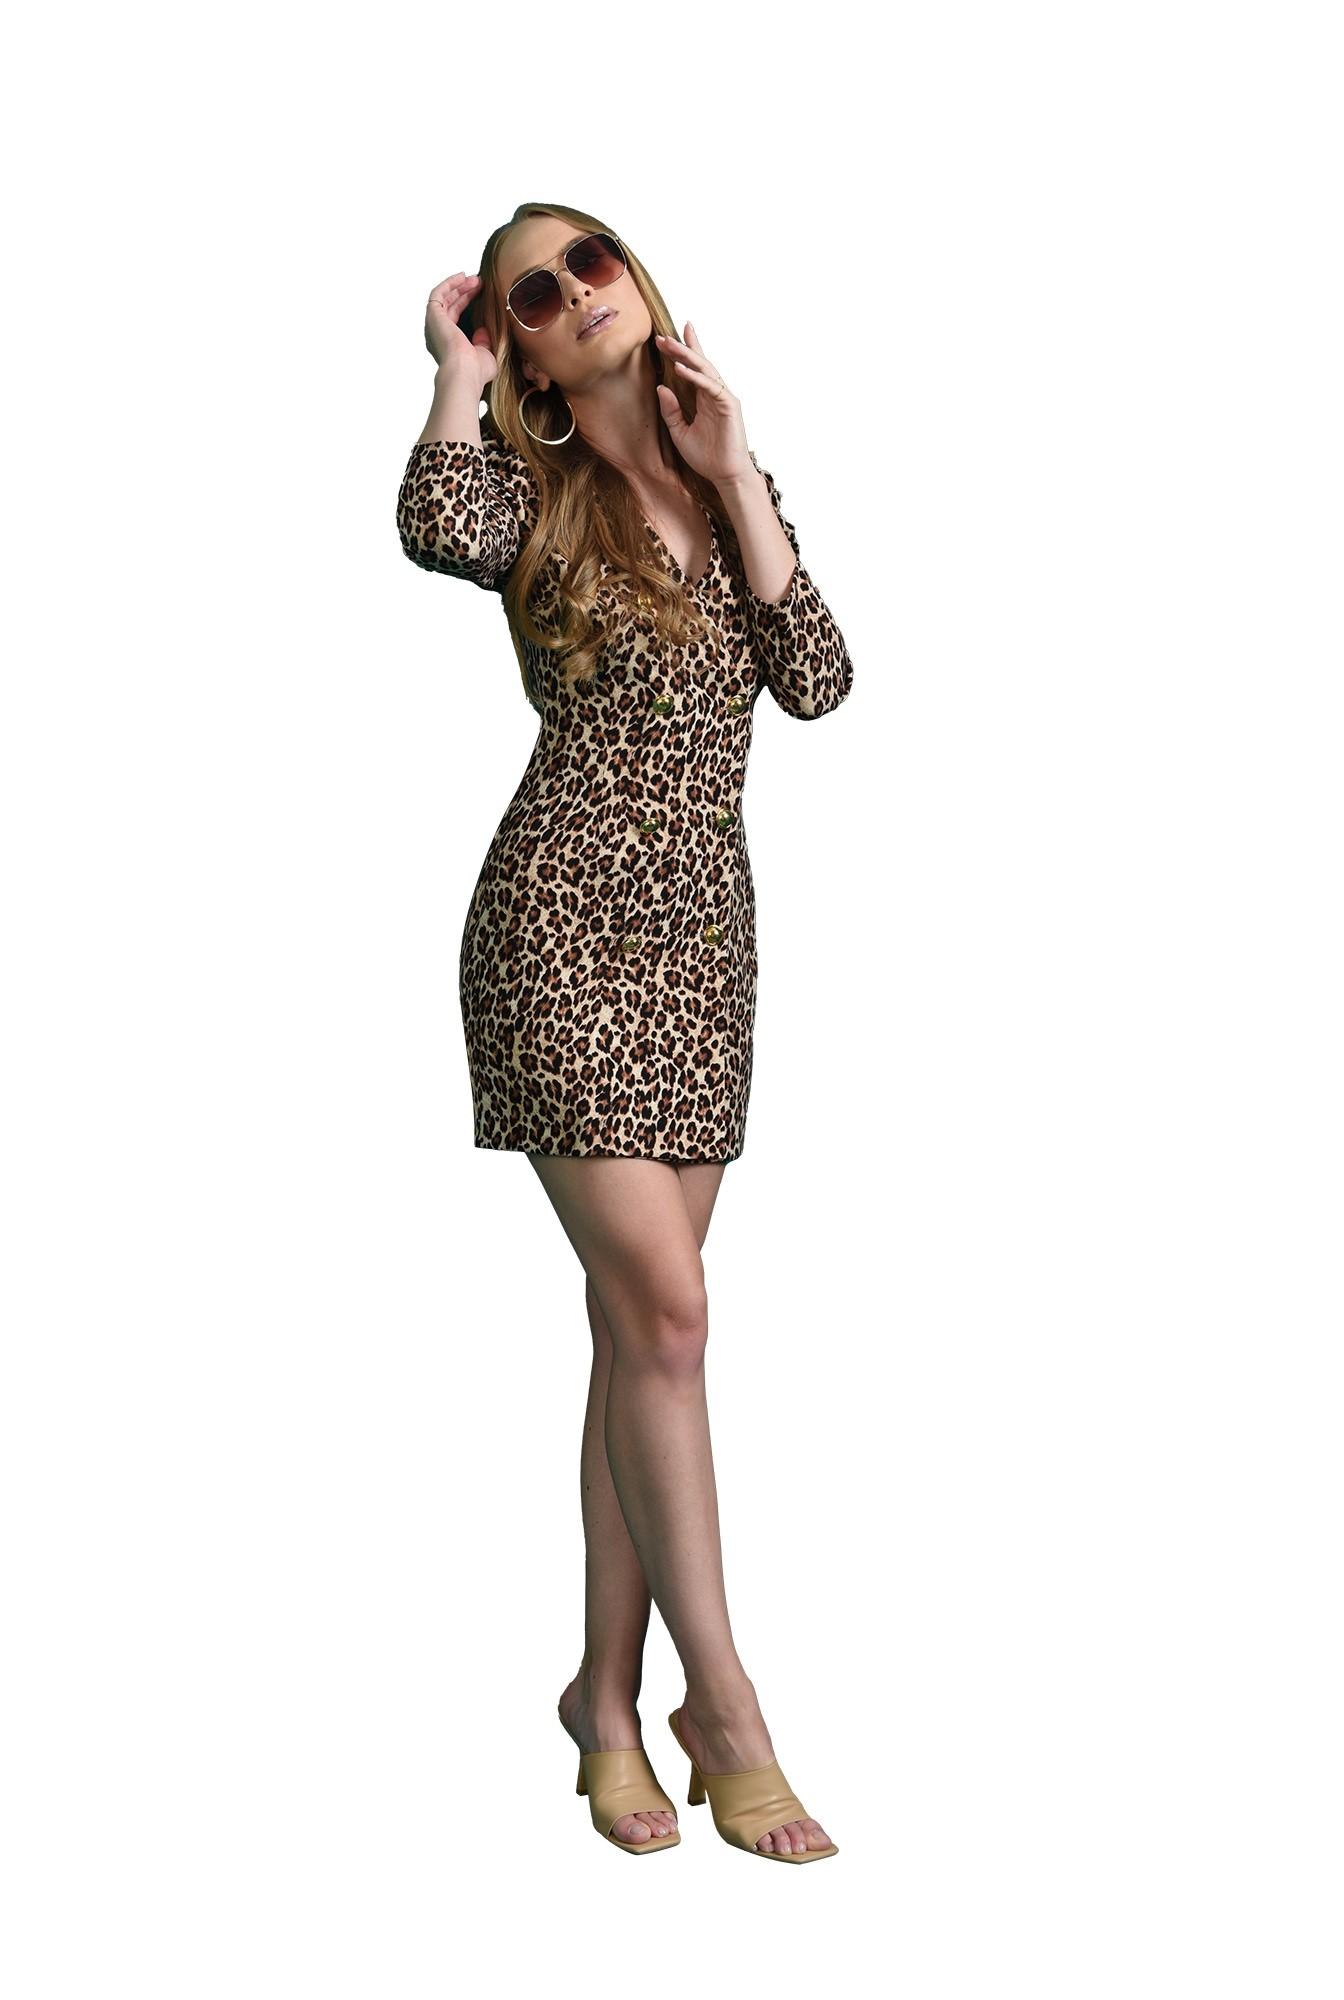 rochie mini, animal print, cu umeri accentuati